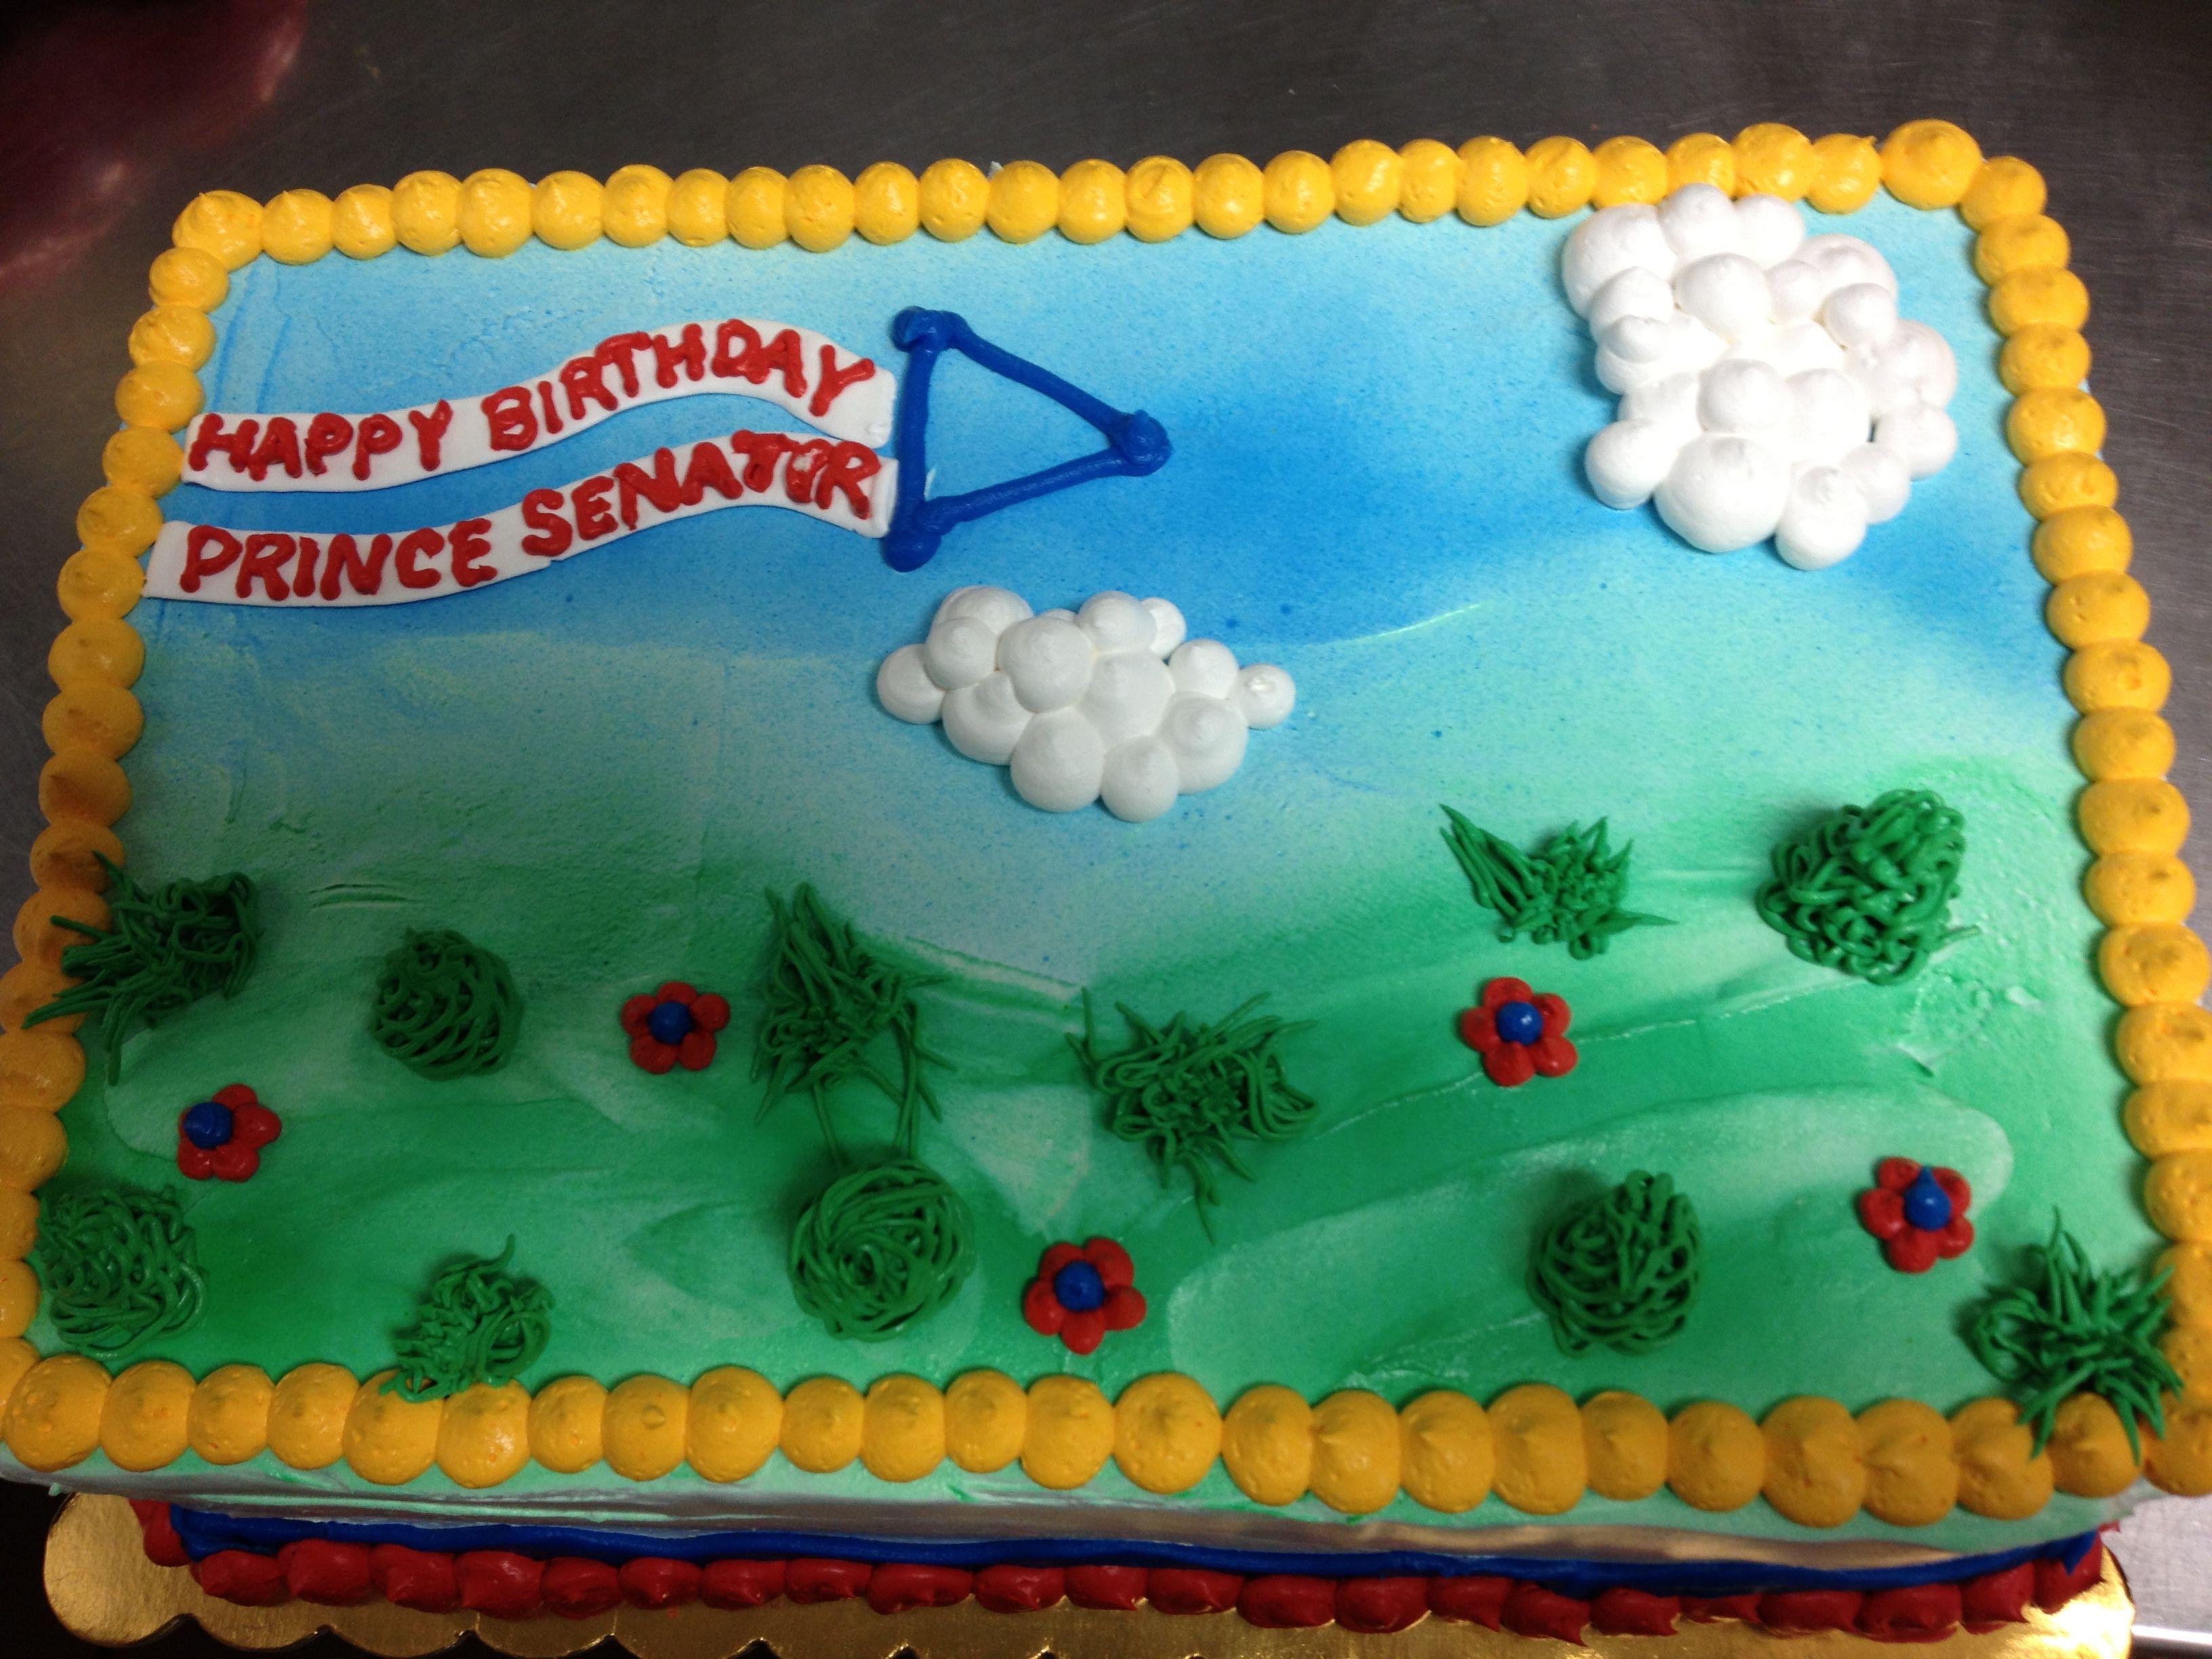 Decorative Ice Cream Cake For That Special Birthday Cold Stone Creamery Ice Cream Cake Caribou Coffee